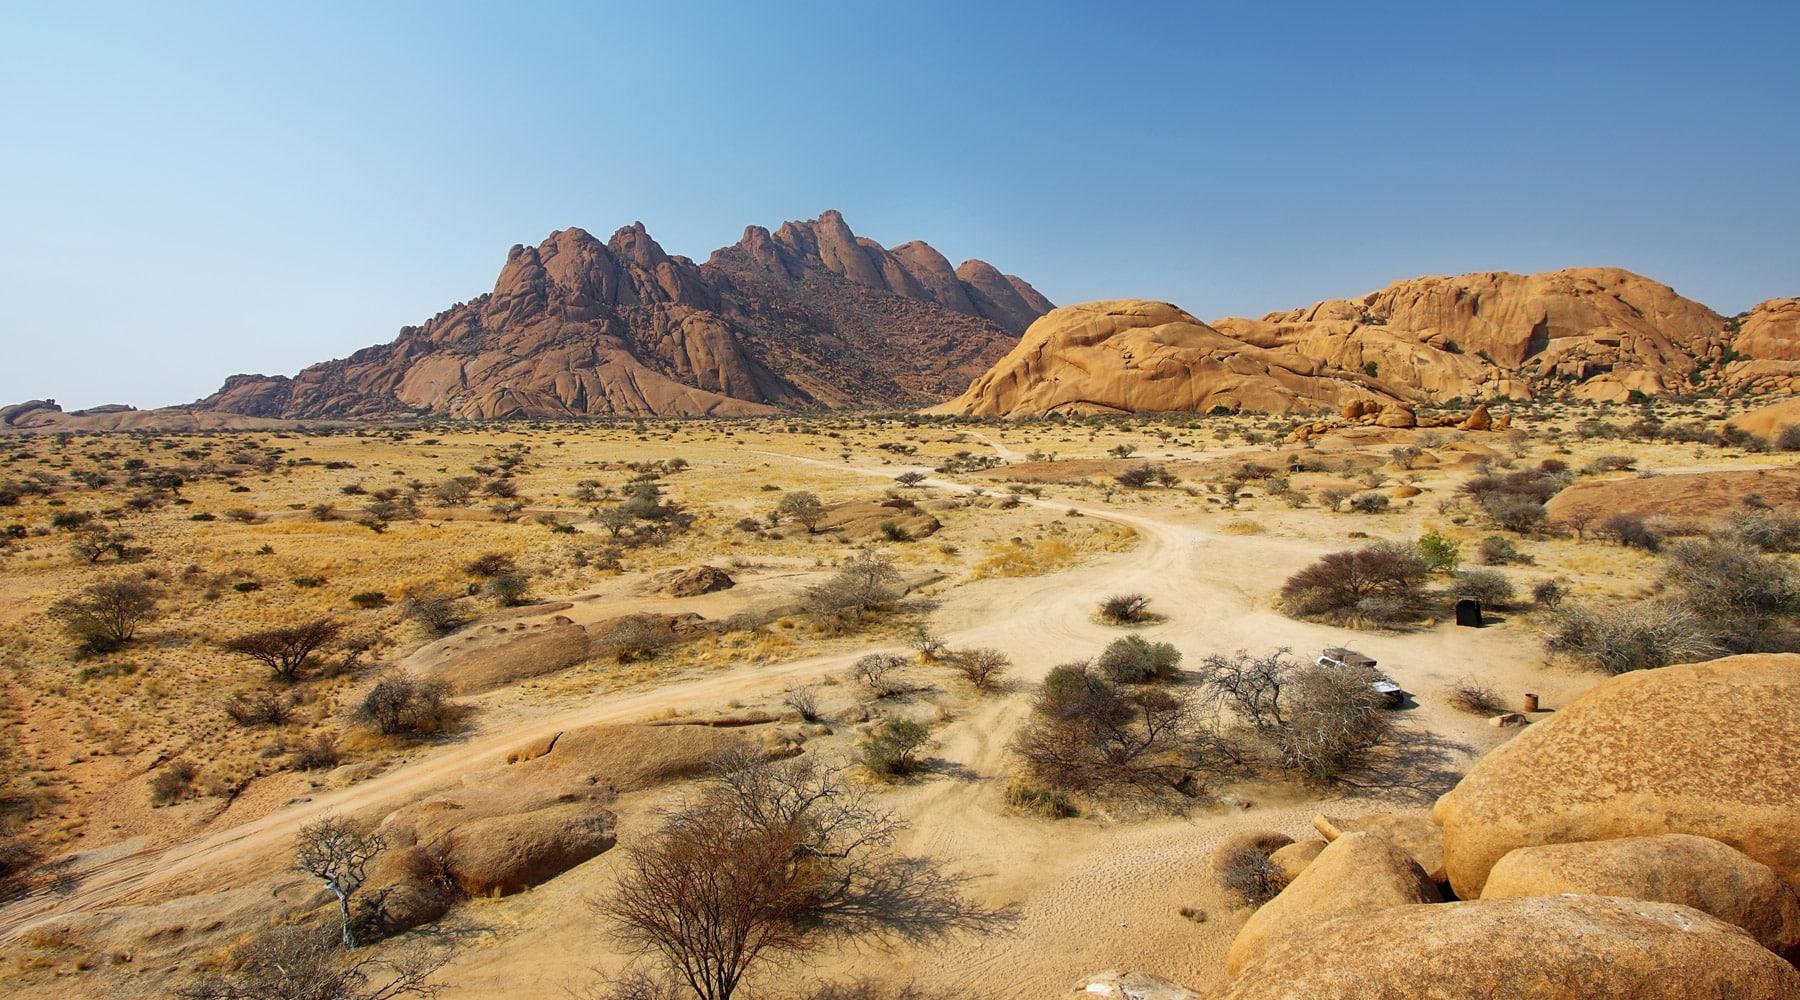 Damaraland– The Fantastic Mountainous Region in Namibia